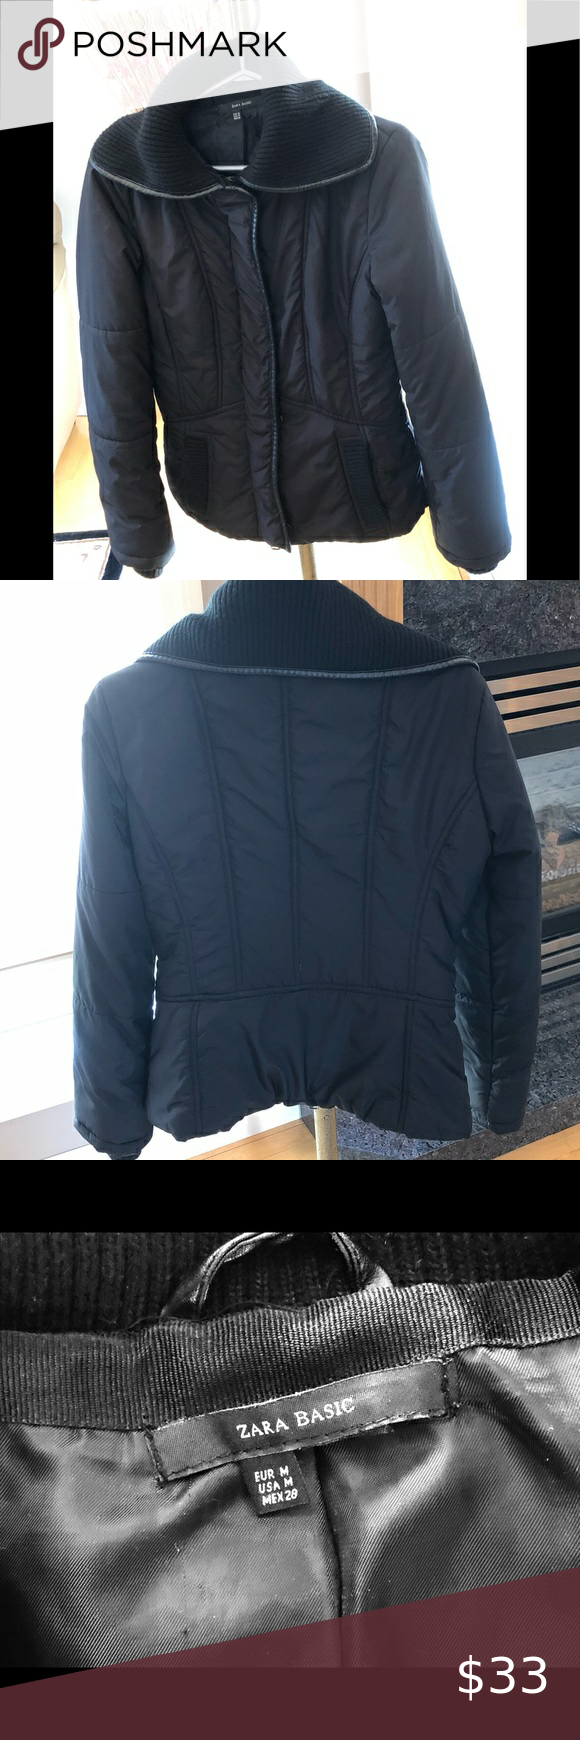 Zara Basic Women S Winter Jacket Medium Guc Jackets Zara Basic Winter Jackets Women [ 1740 x 580 Pixel ]